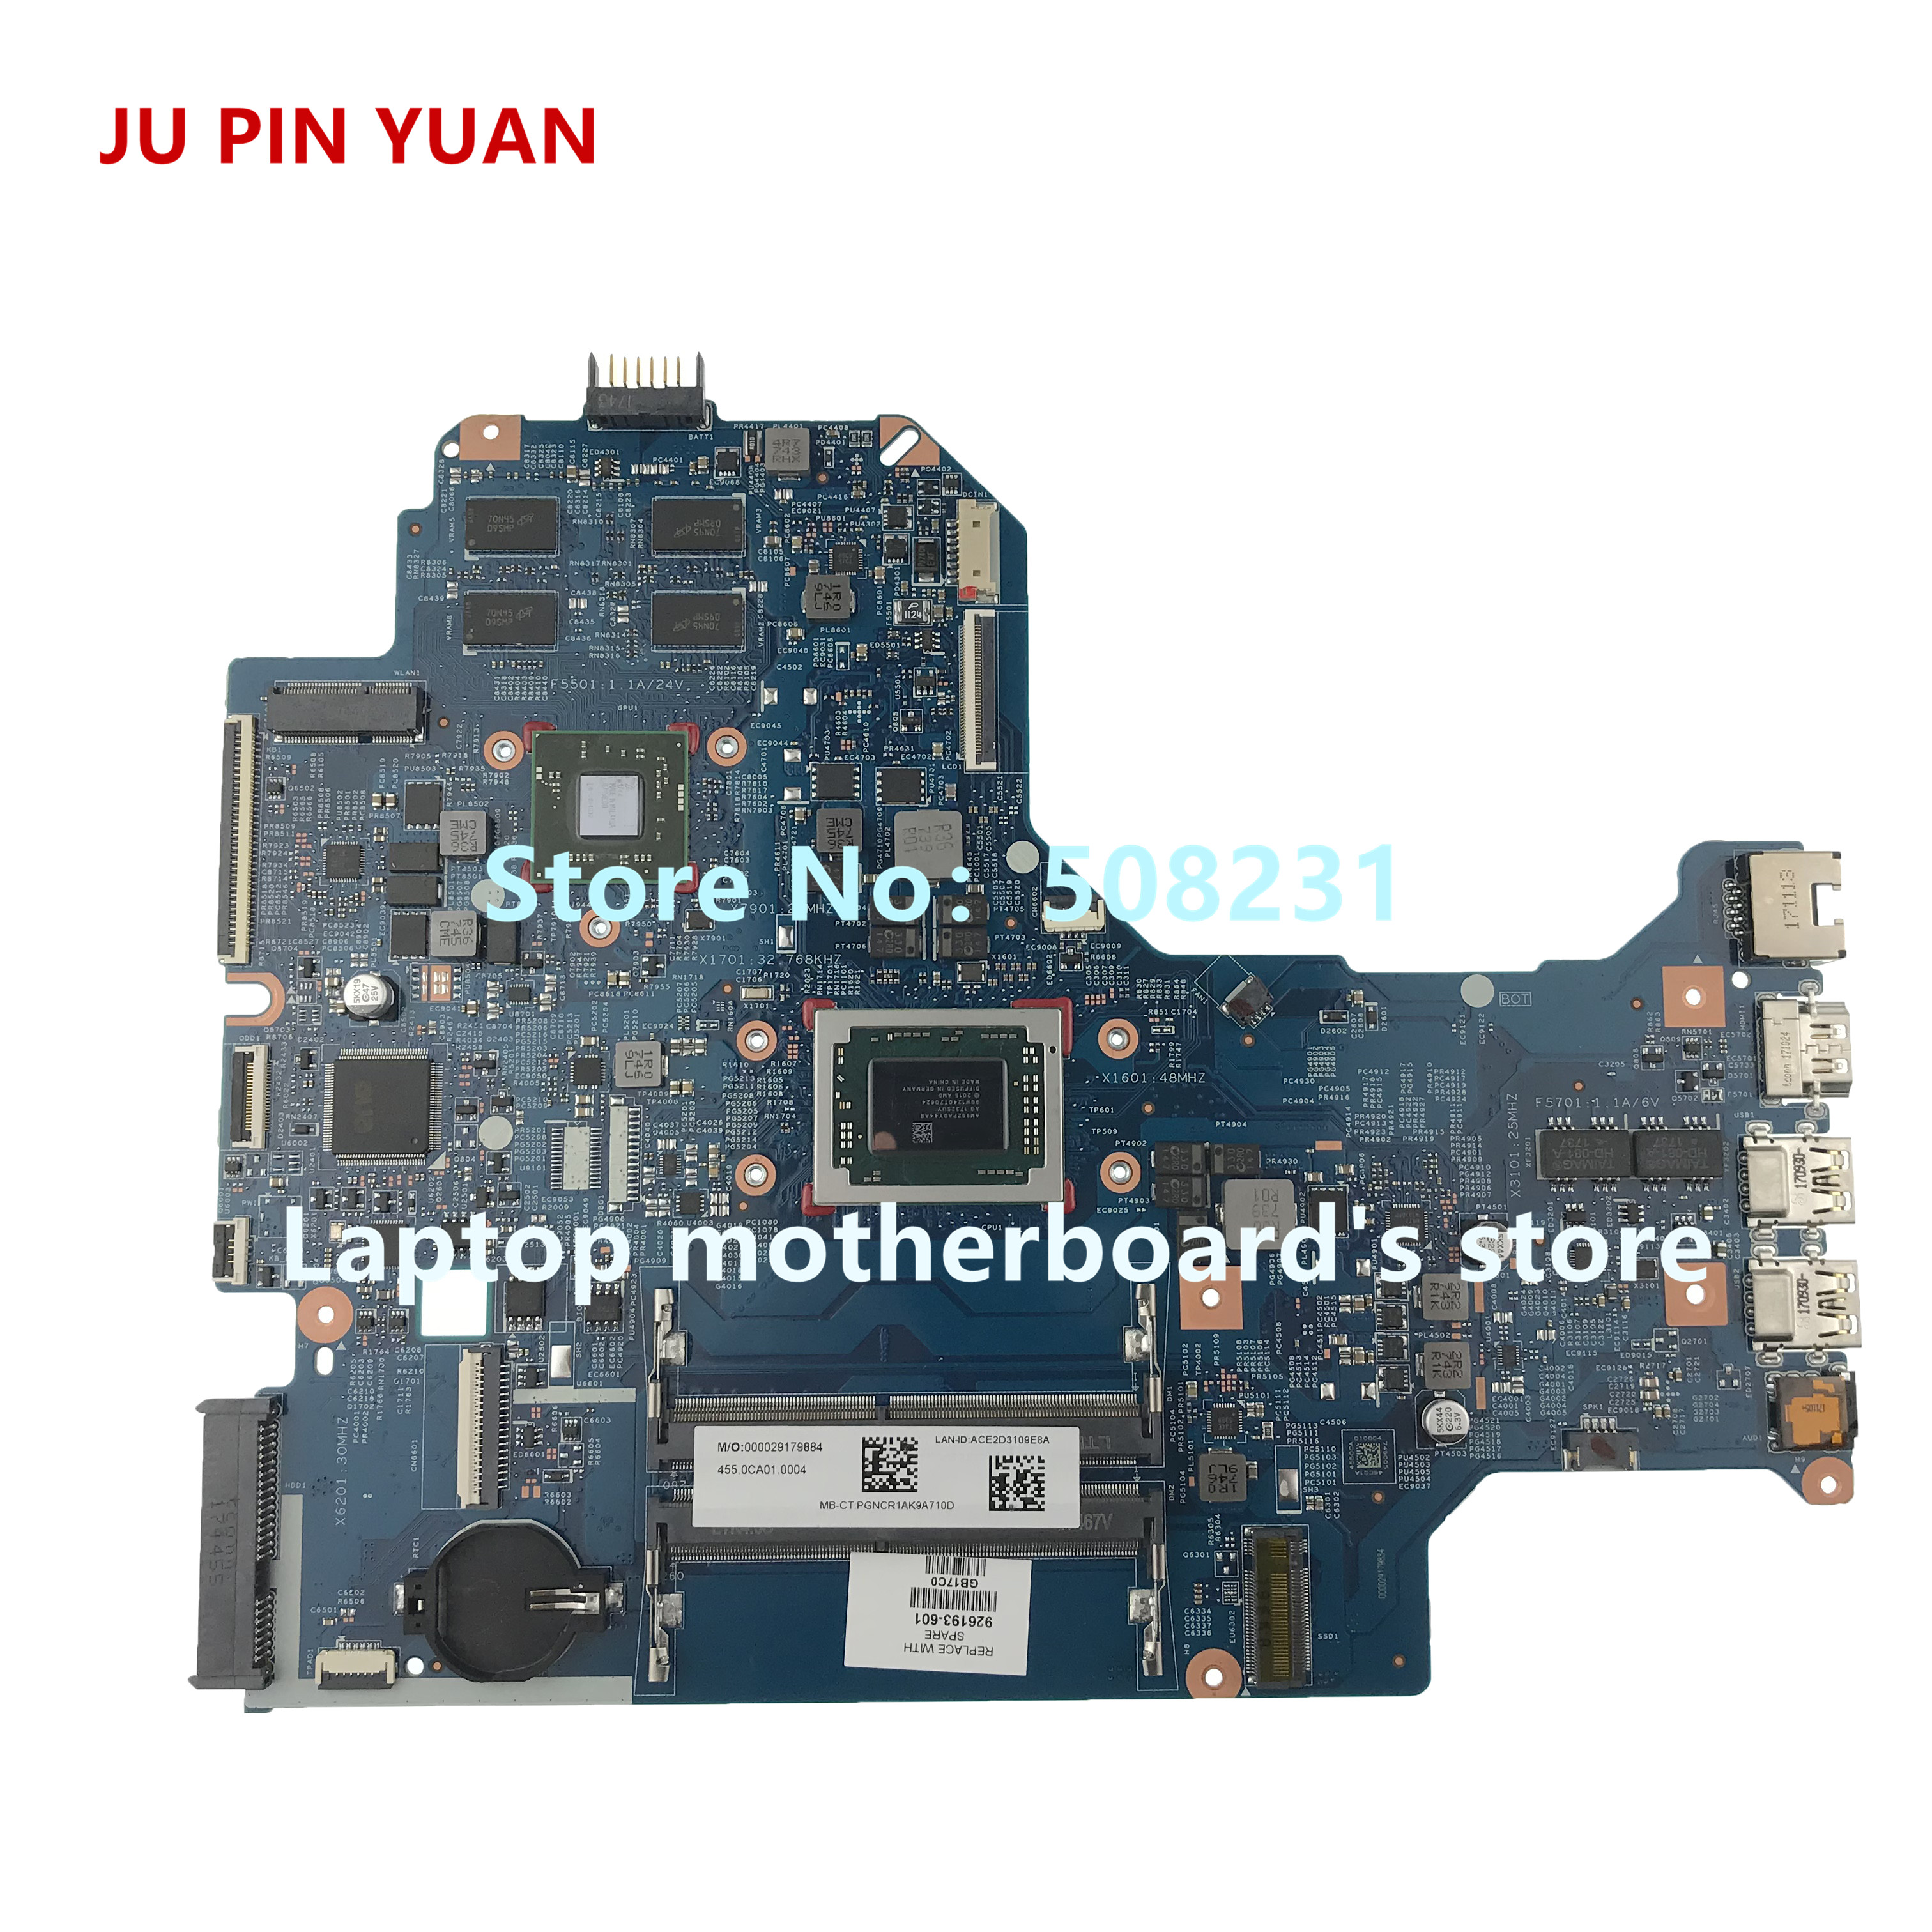 JU PIN YUAN 926193-601 926193-501 448.0CA02.0011 mainboard For HP LAPTOP 17-AK 17Z-AK Laptop Motherboard 530 2GB A10-9620PJU PIN YUAN 926193-601 926193-501 448.0CA02.0011 mainboard For HP LAPTOP 17-AK 17Z-AK Laptop Motherboard 530 2GB A10-9620P